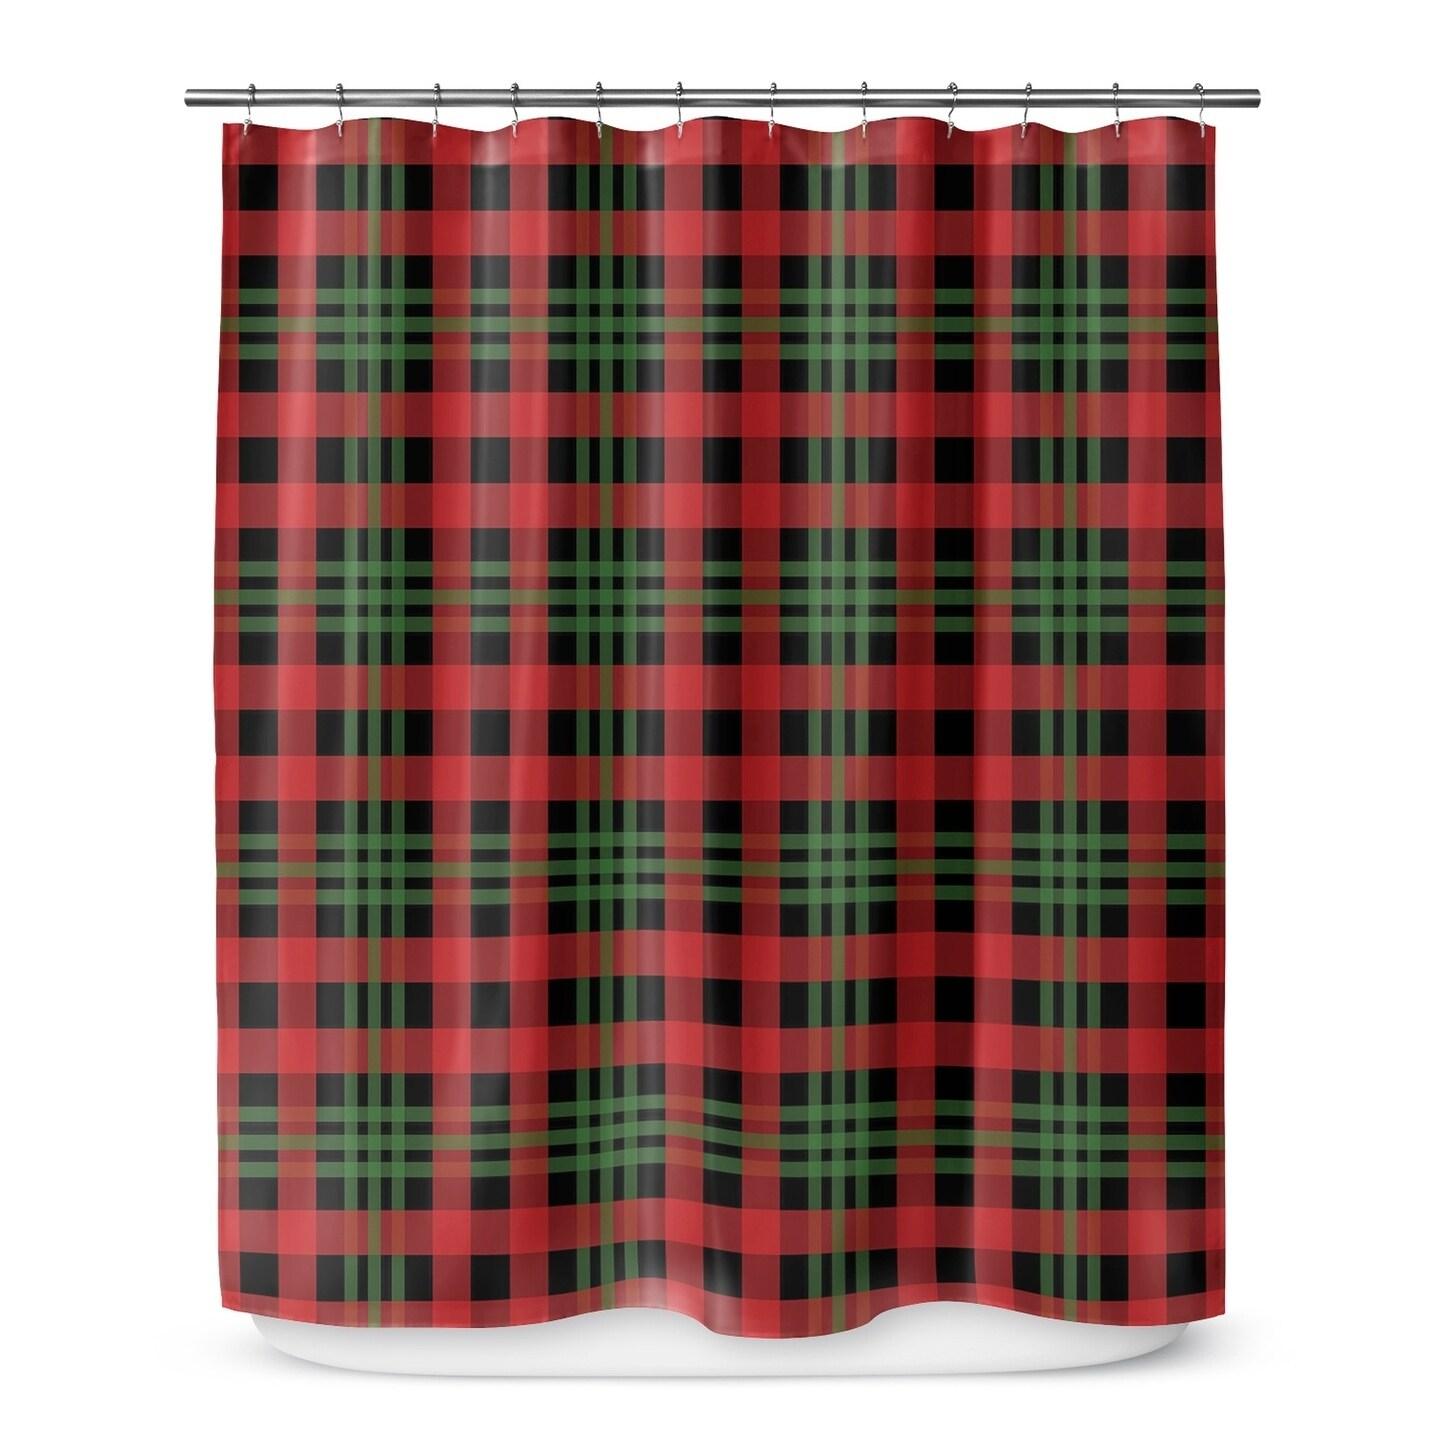 Christmas Plaid 3 Shower Curtain By Terri Ellis